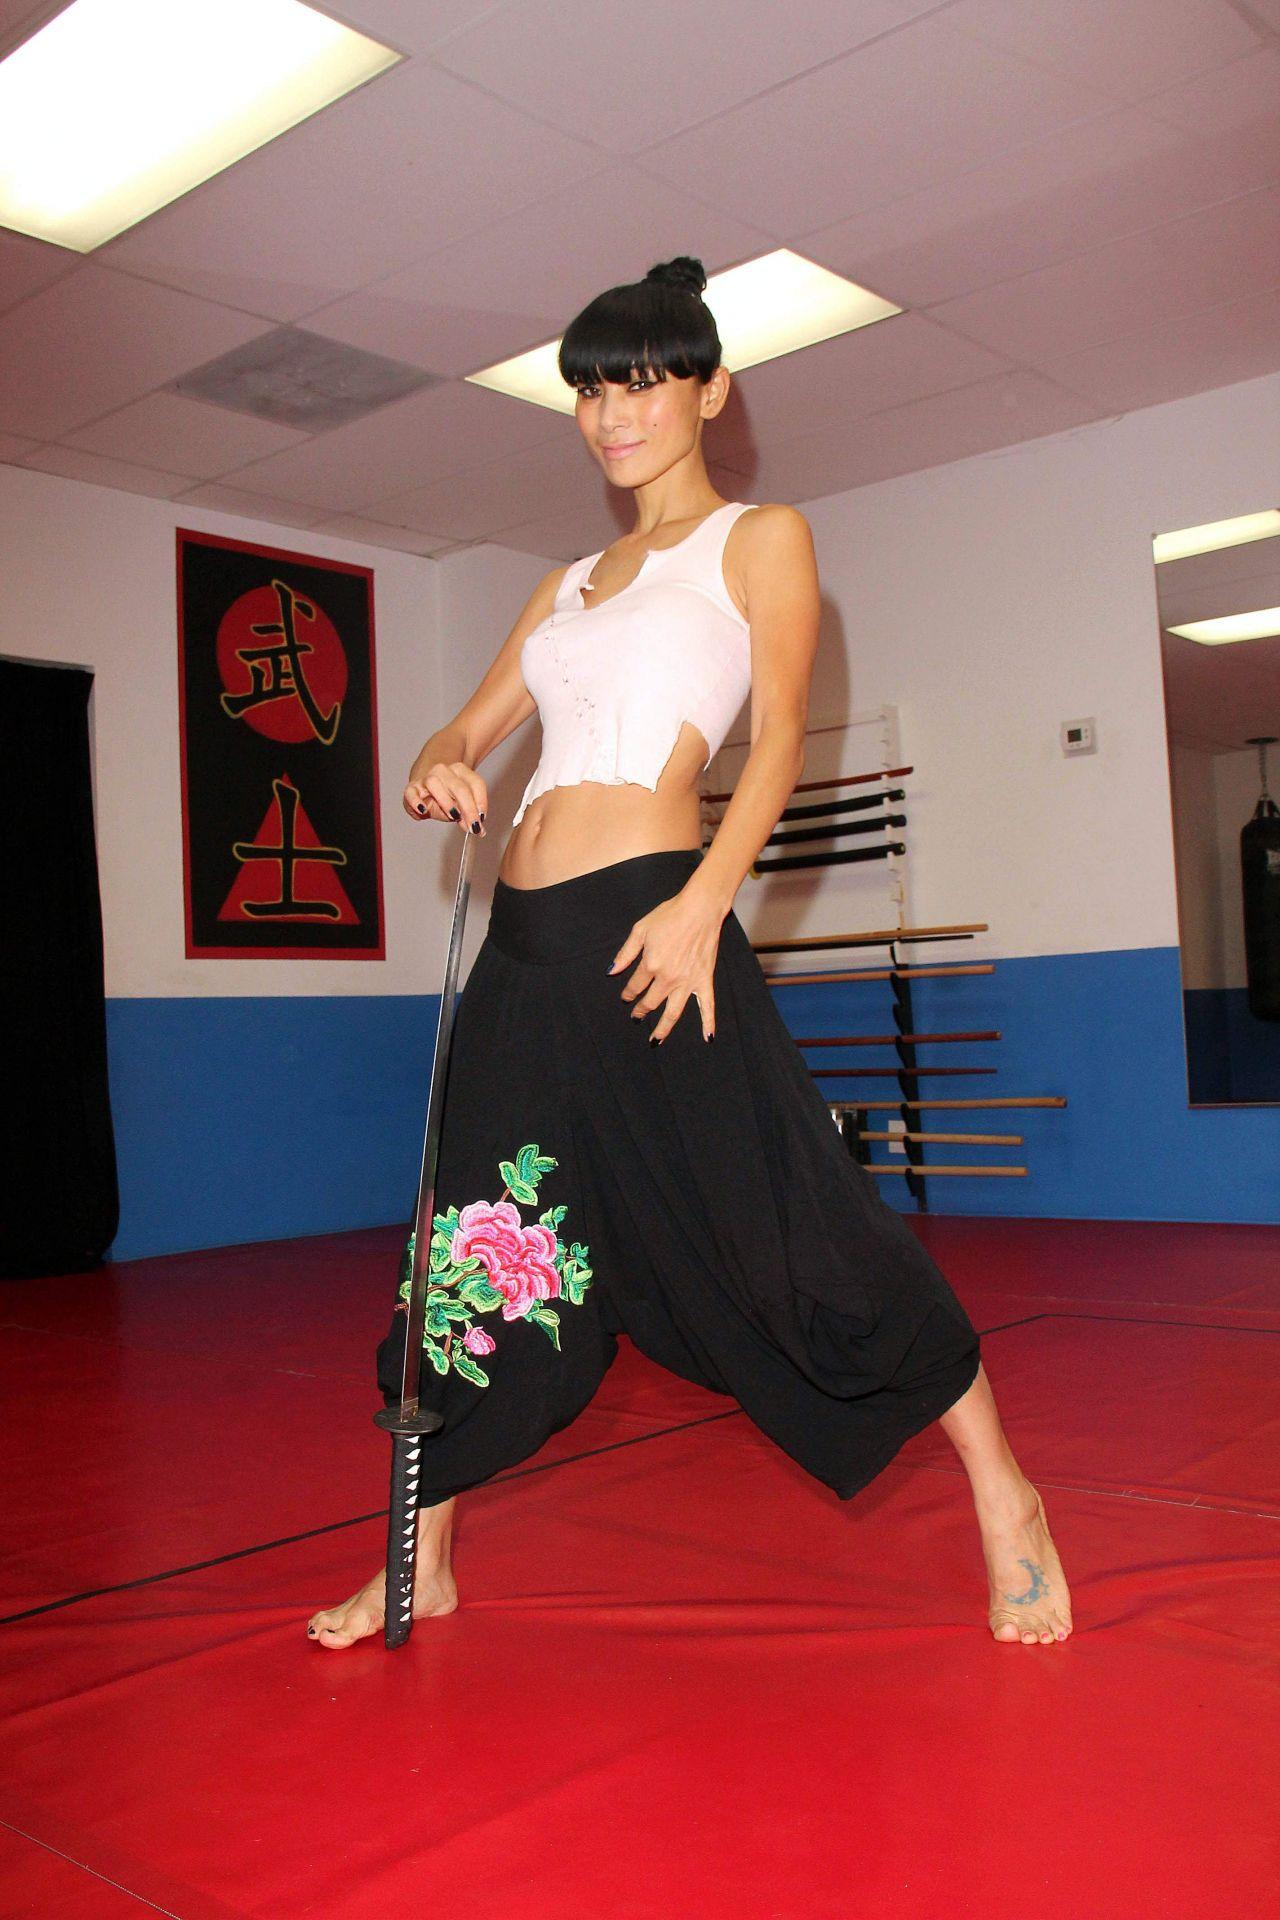 Bai Ling Martial Arts Training In Los Angeles December